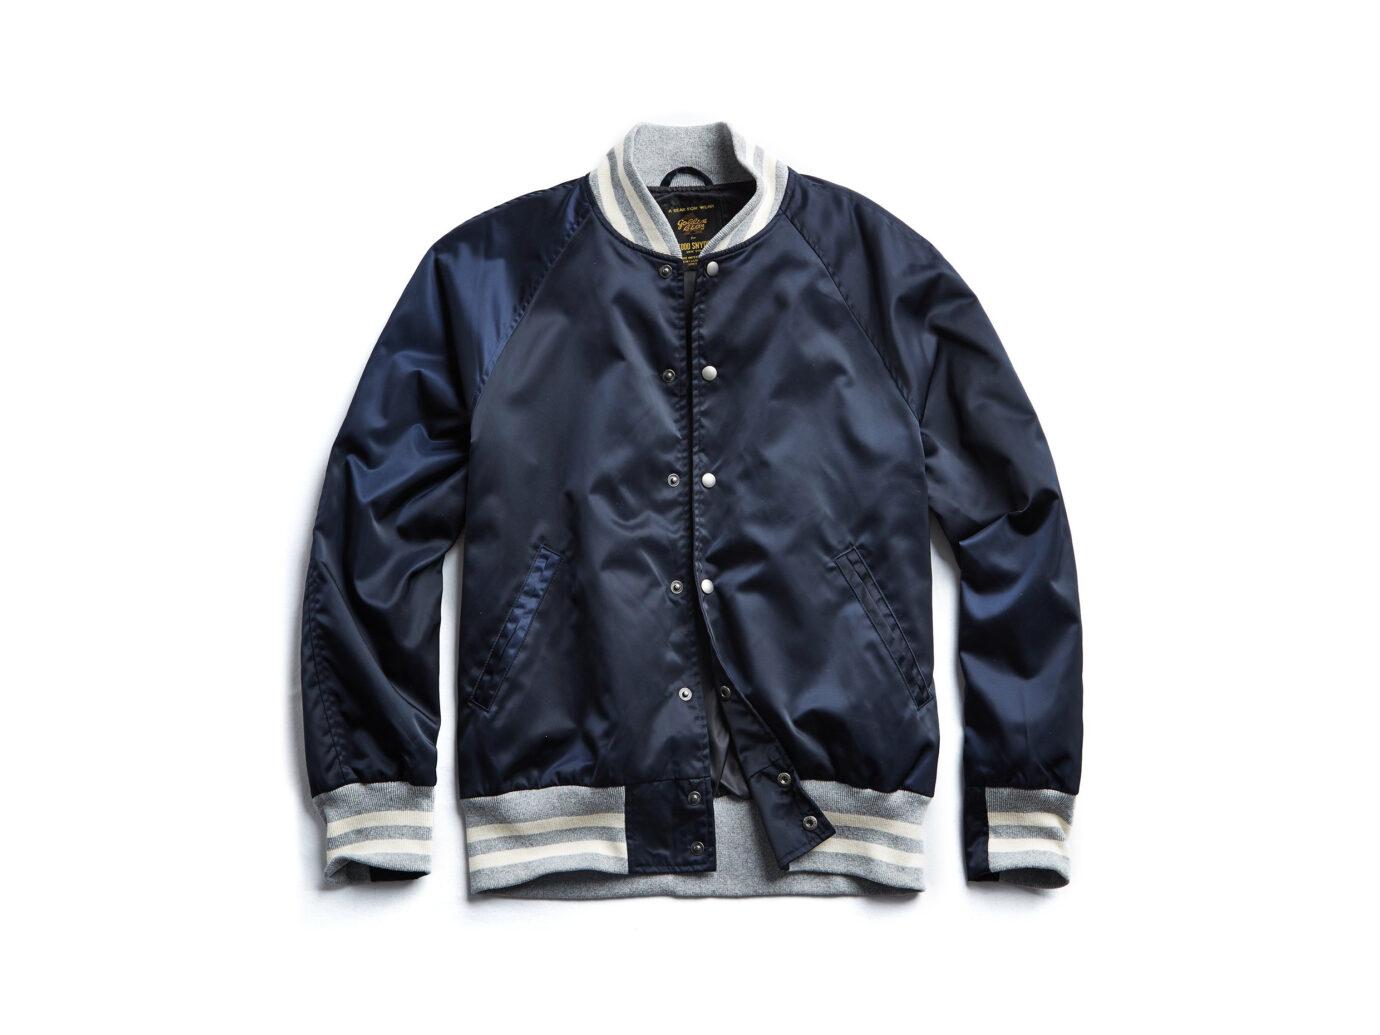 Todd Snyder + Golden Bear Japanese Nylon Snap Bomber Jacket